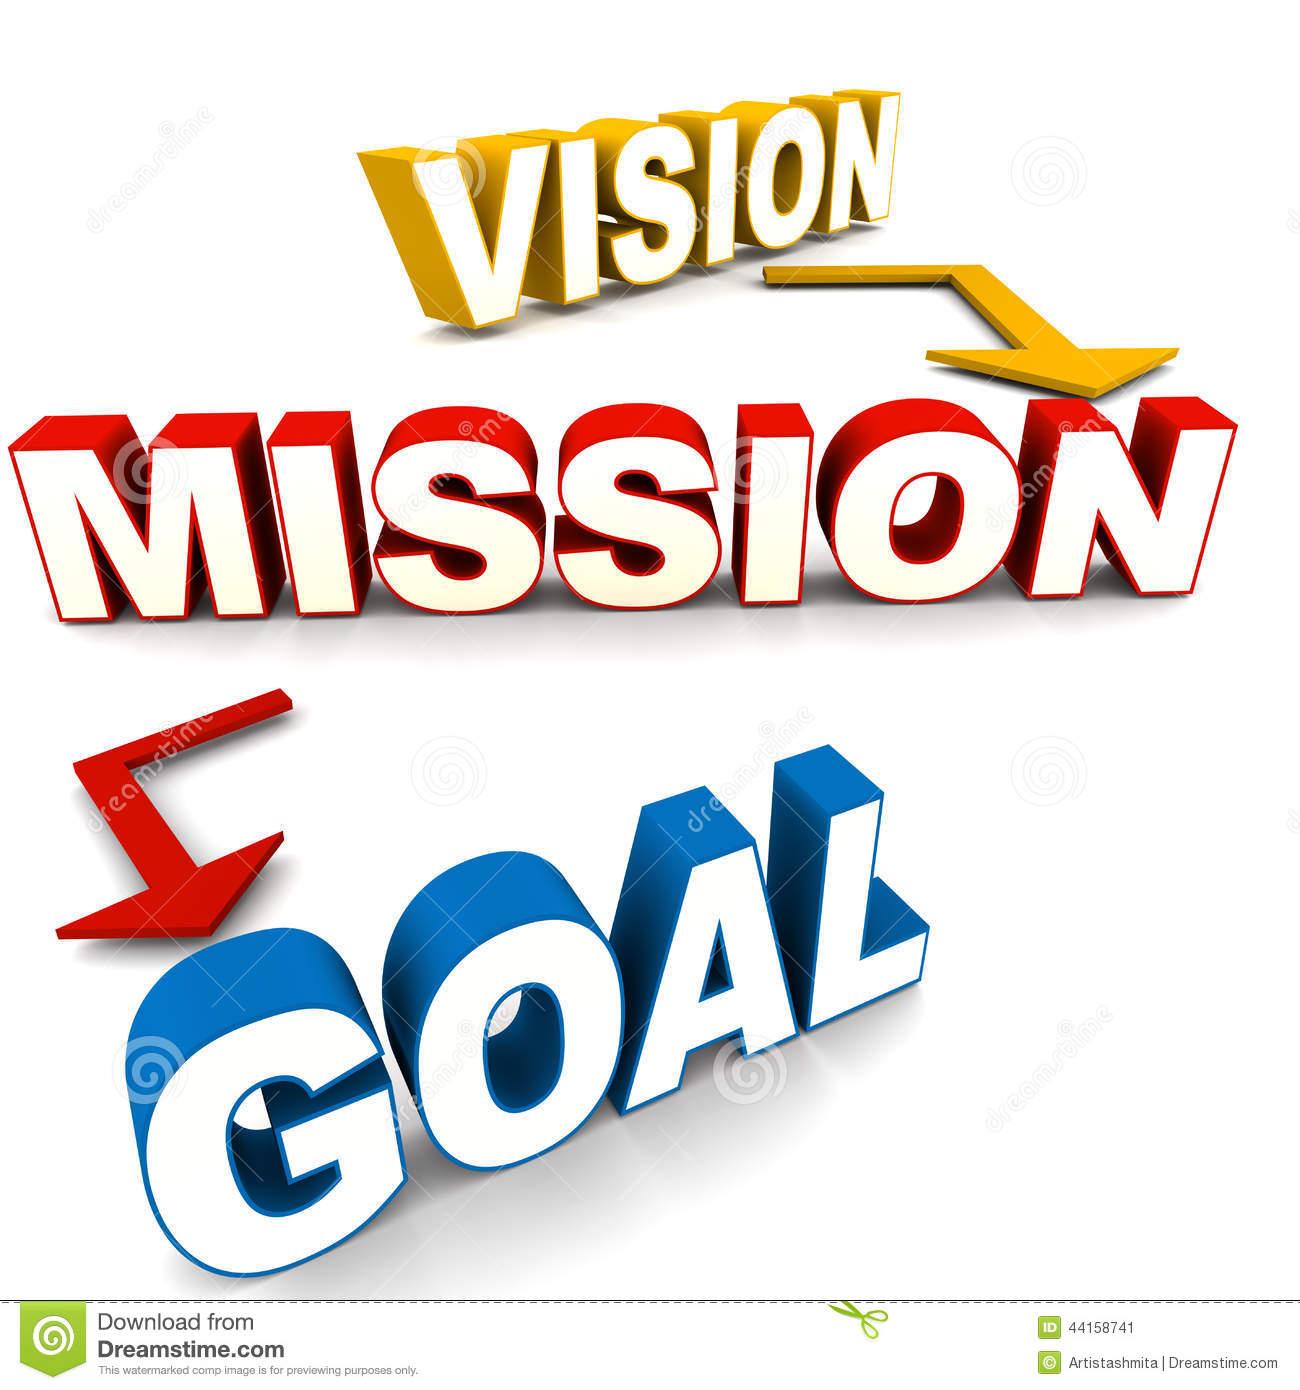 Missions clipart. Clip art images panda